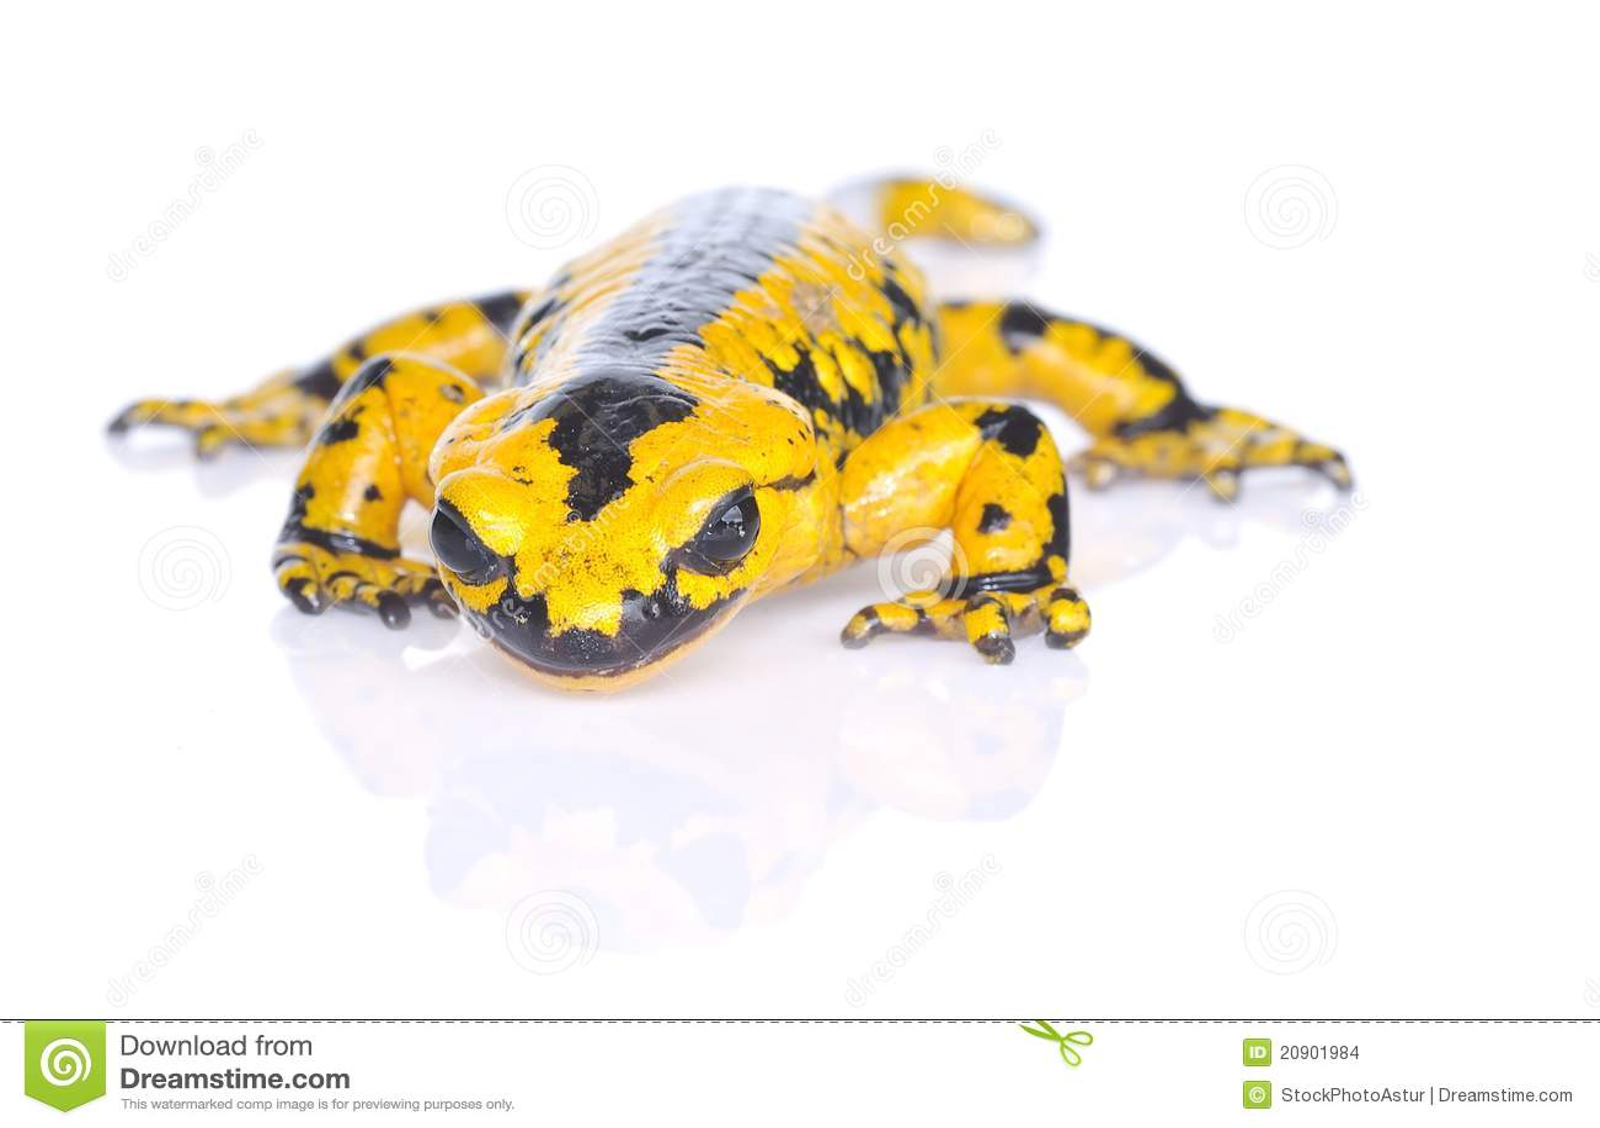 salamander white background - photo #29